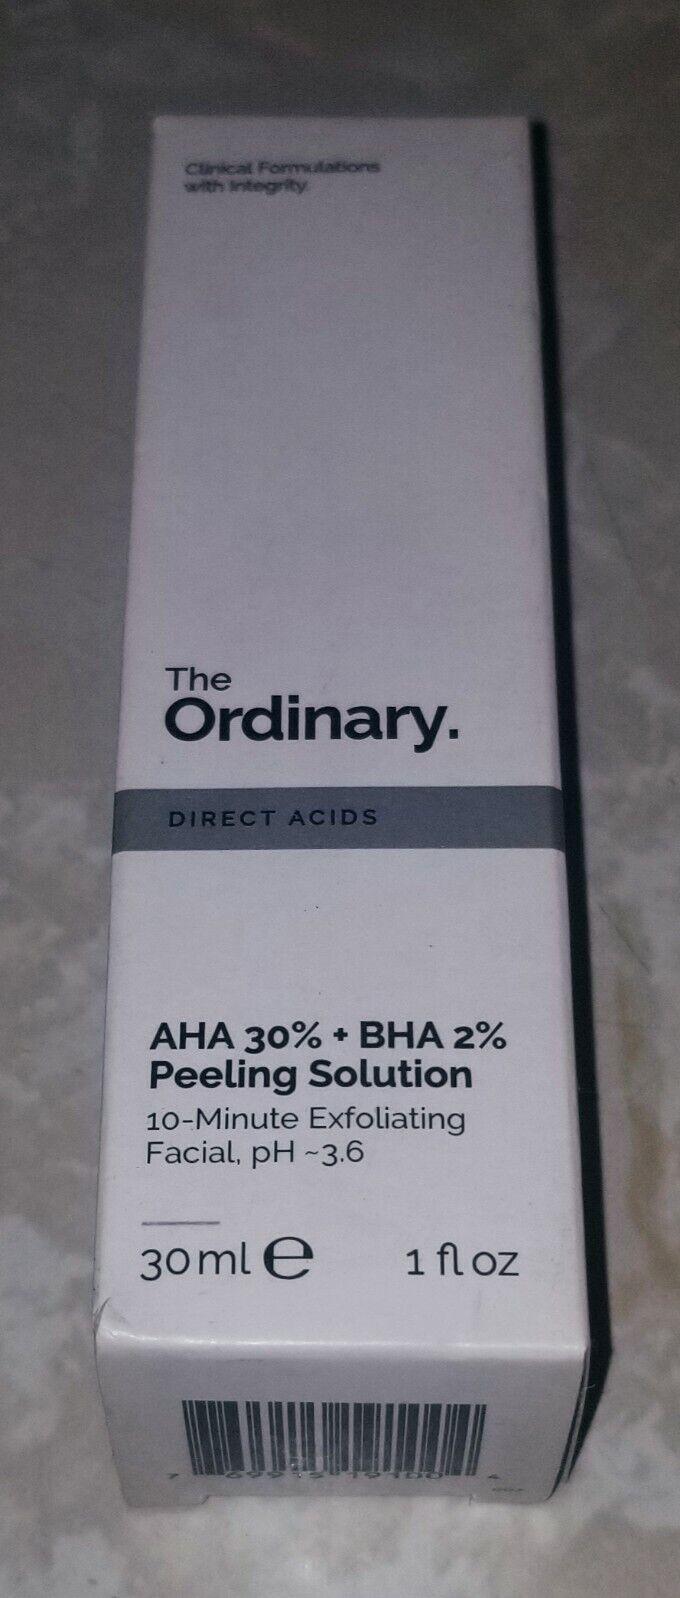 The Ordinary - AHA 30% + BHA 2% Peeling Solution - NIB Authentic 1oz/30ml 2